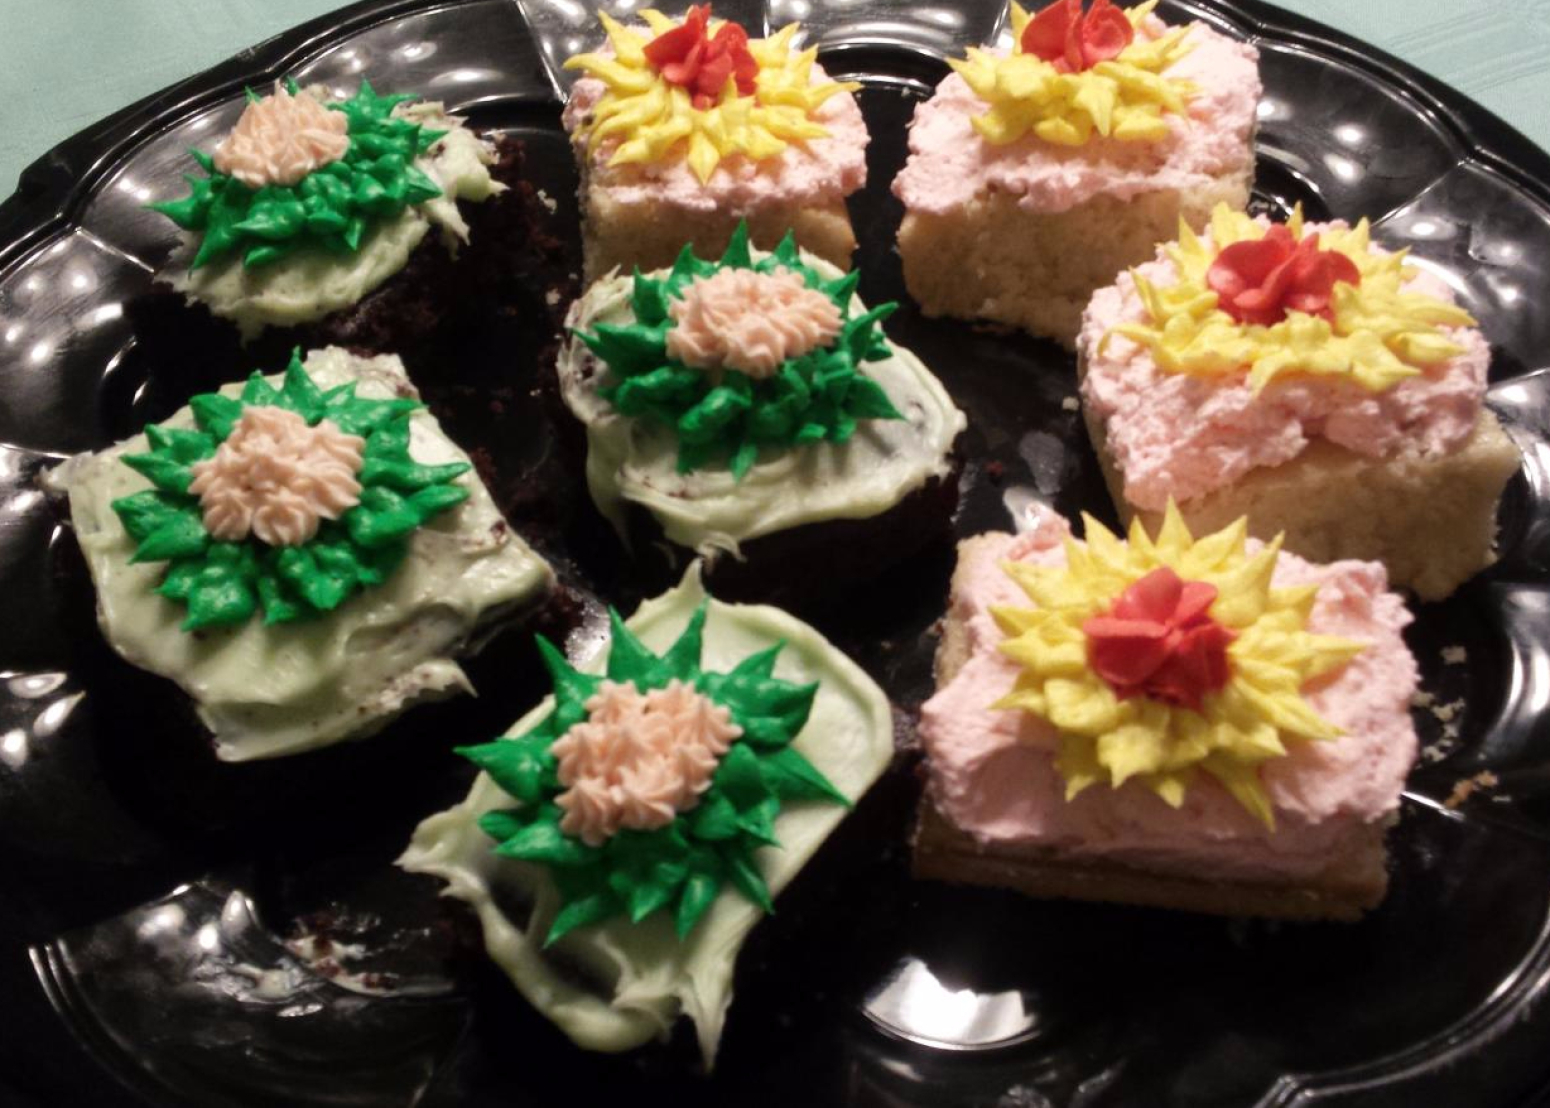 Cake Decorating Recipes : CAKE SQUARES DECORATED AT CAKE DECORATING CLASS Recipe ...